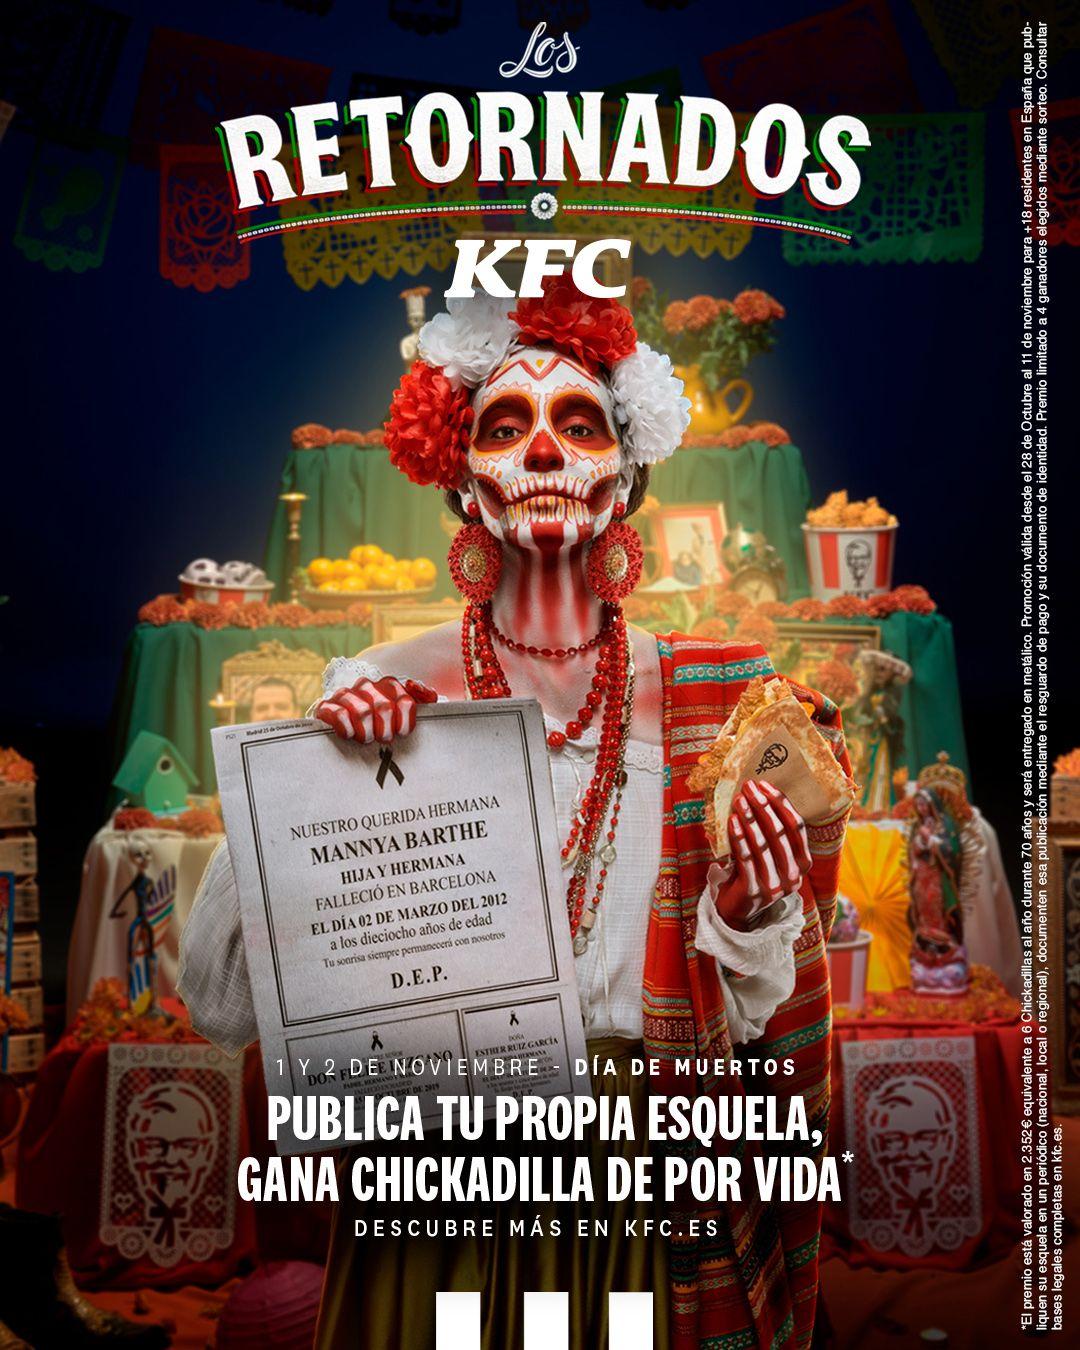 Foto de Los Retornados / KFC